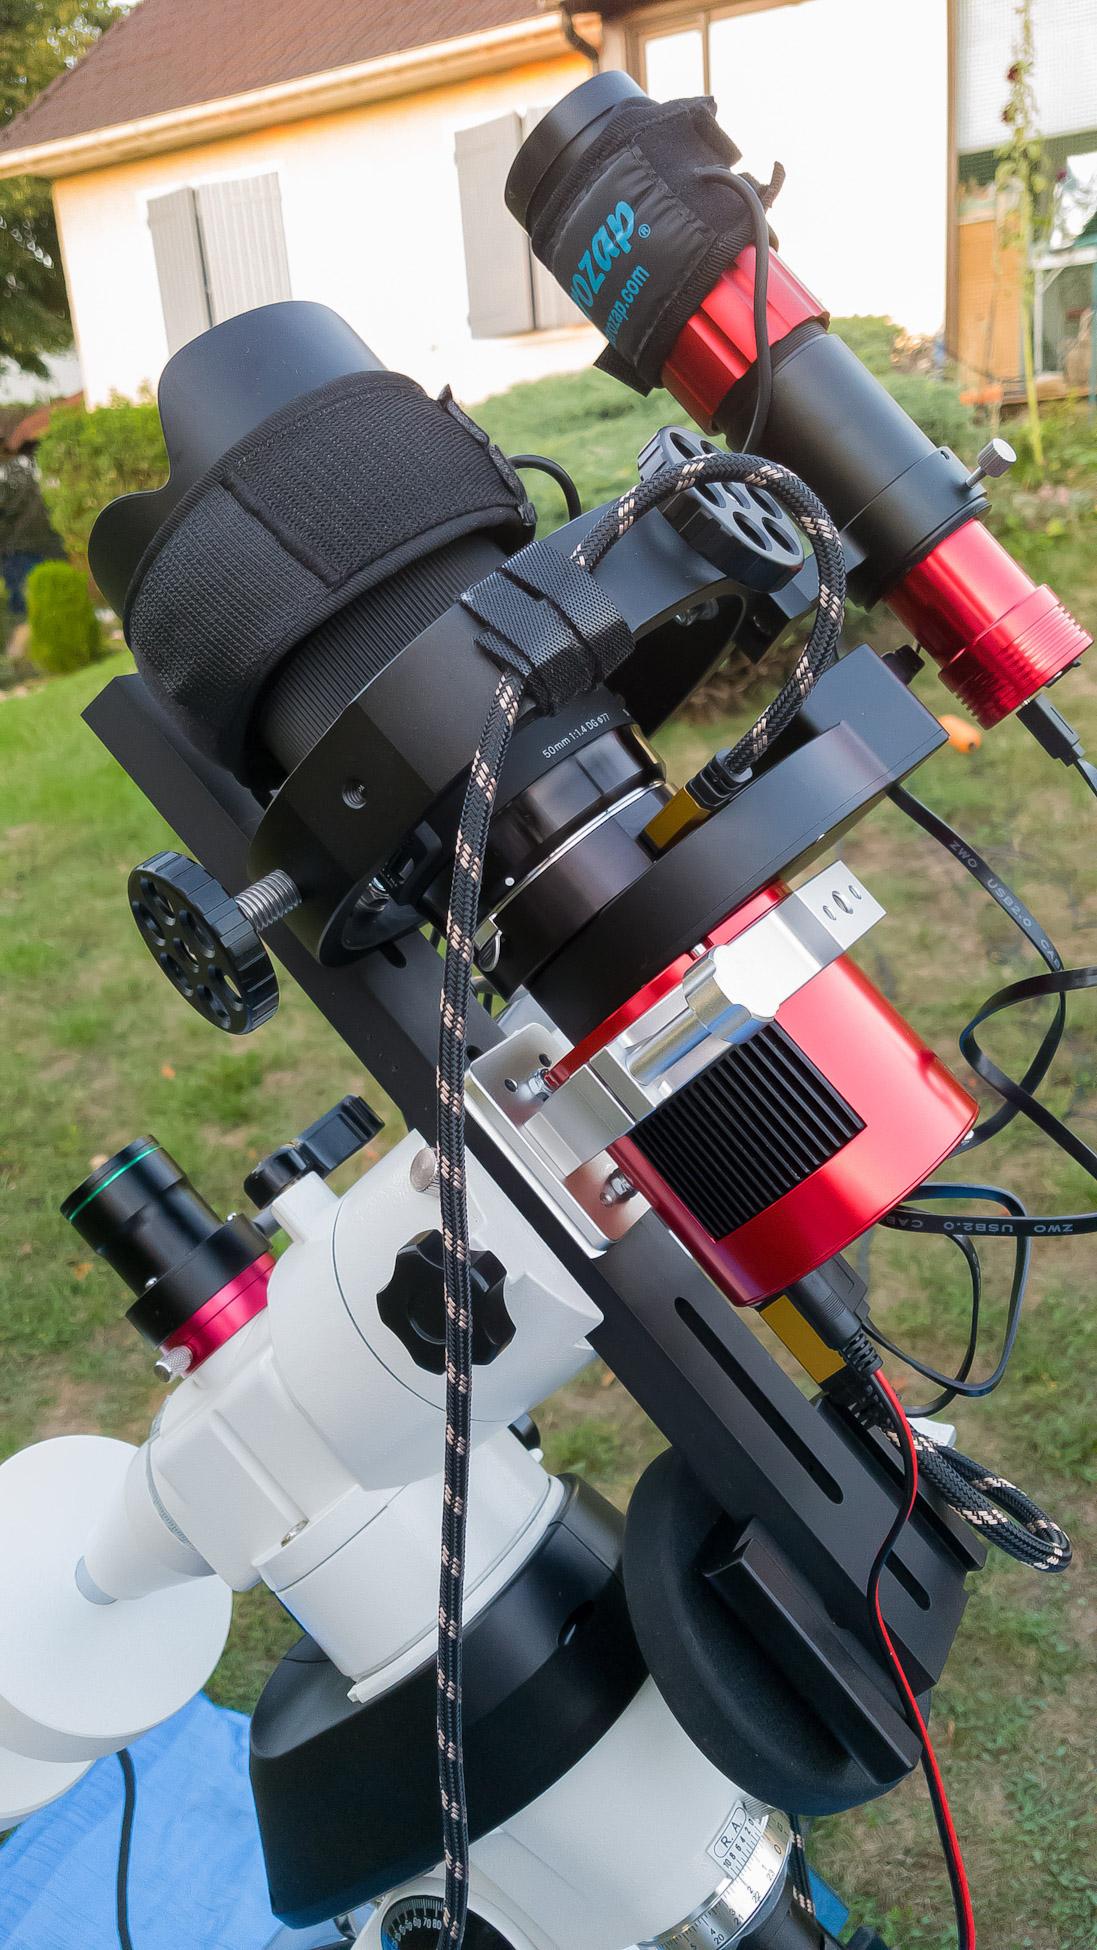 Focuser pour objectifs Canon, Sigma, Tamron,... Psx_2010